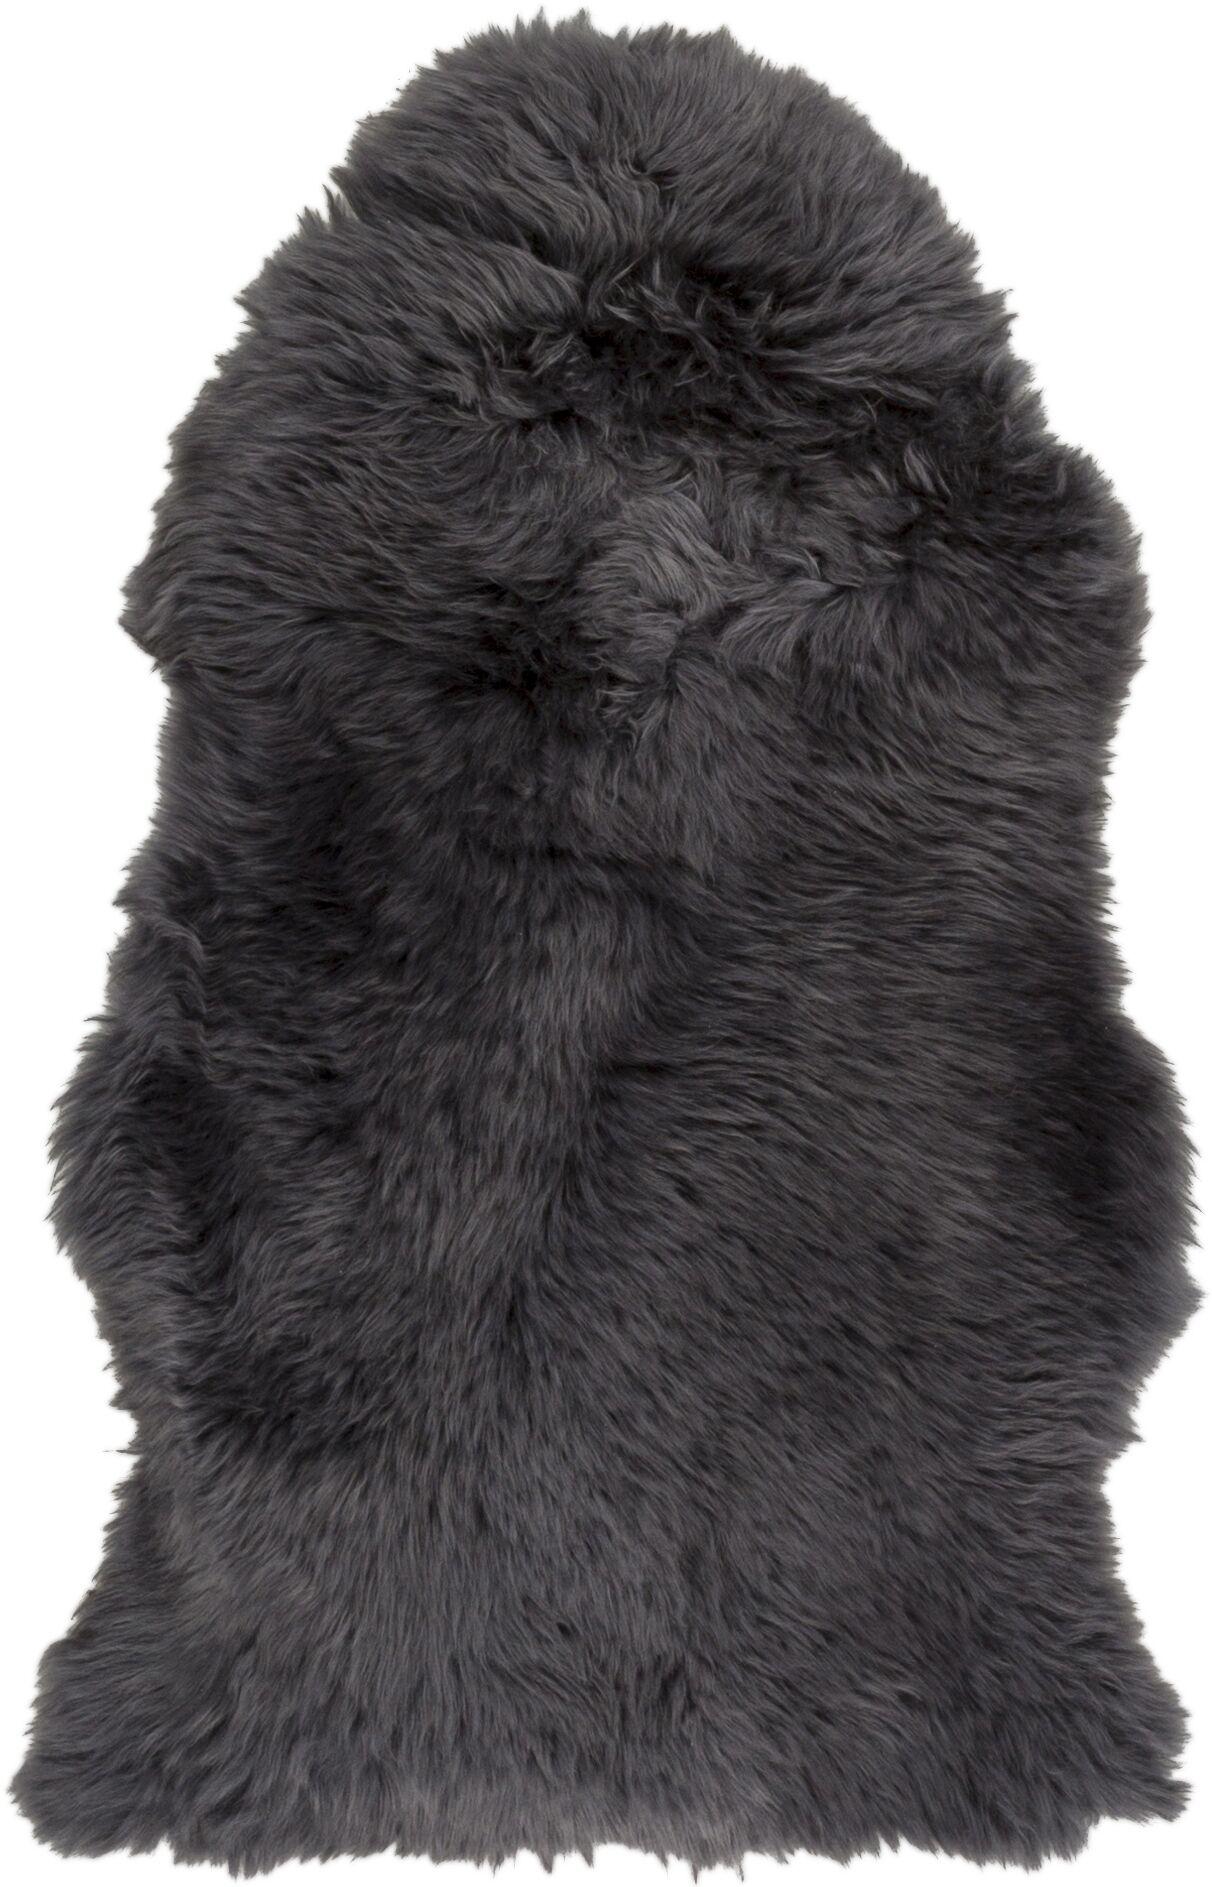 West Hewish Hand-Woven Charcoal Area Rug Rug Size: Rectangle 2' x 3'